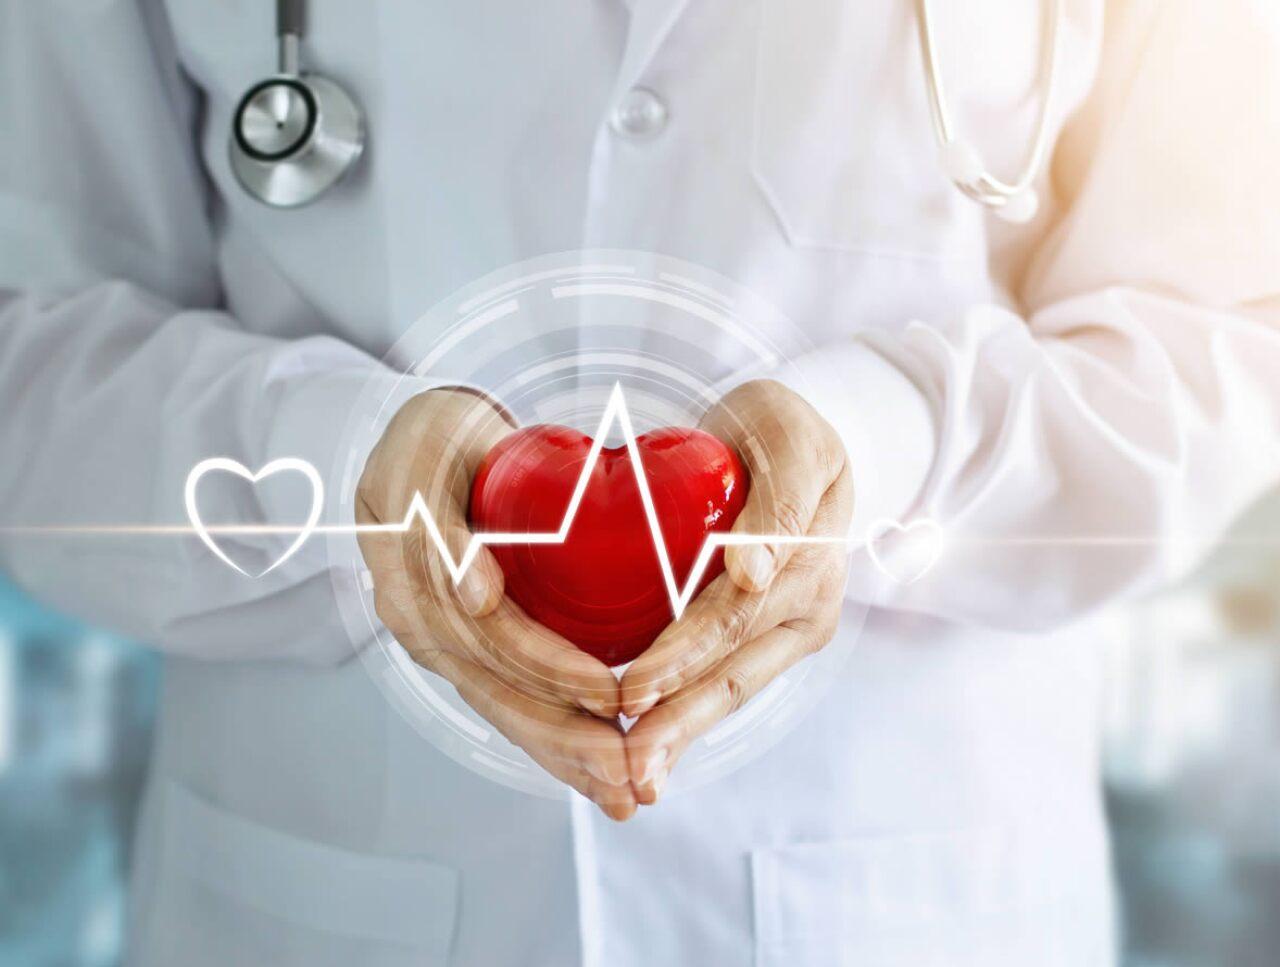 180821 corazon doctor is ipopba.jpg